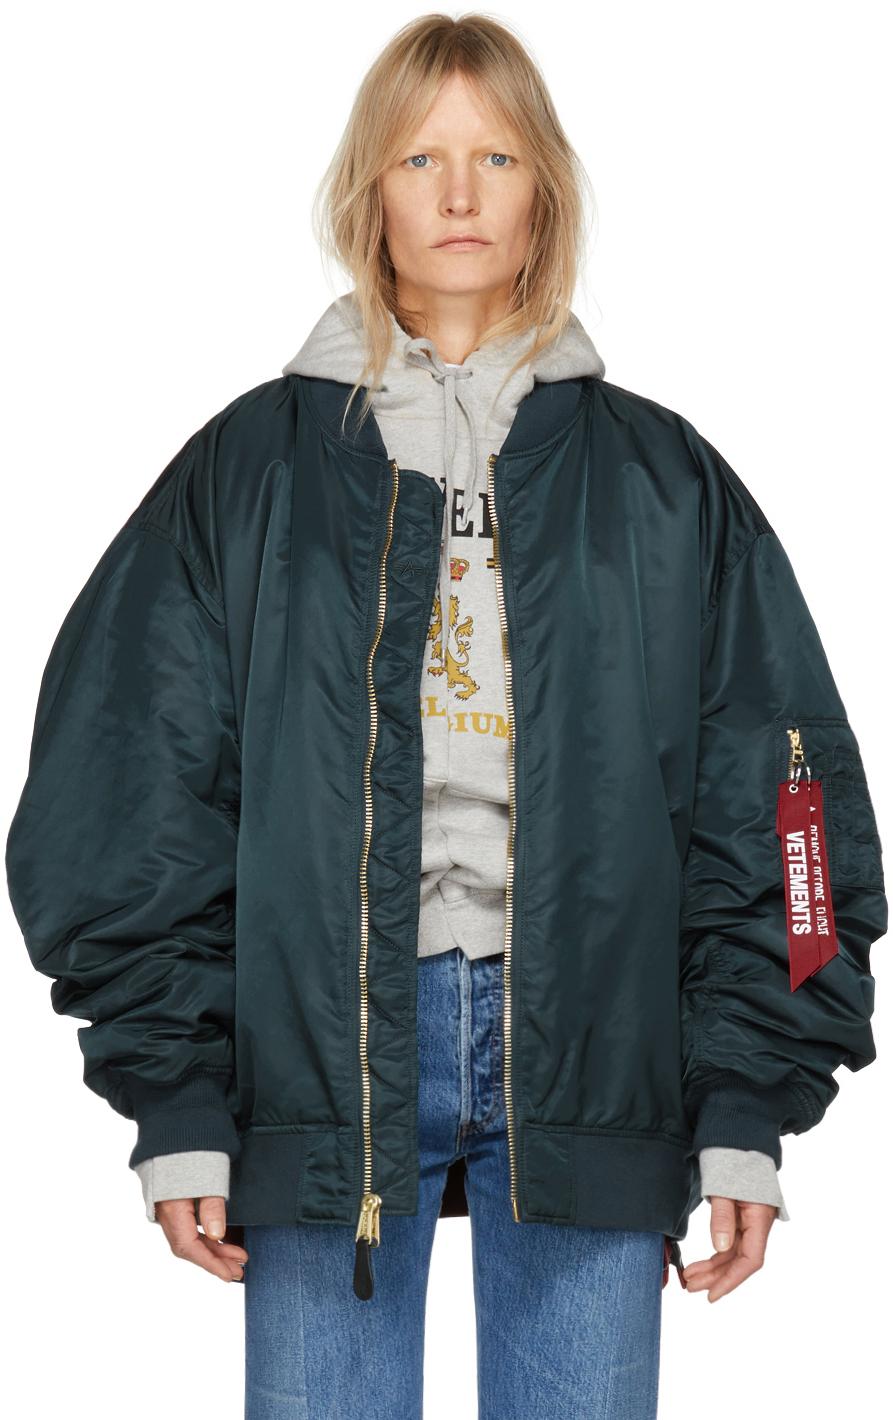 Vetements Jackets Reversible Green Alpha Industries Edition Bomber Jacket